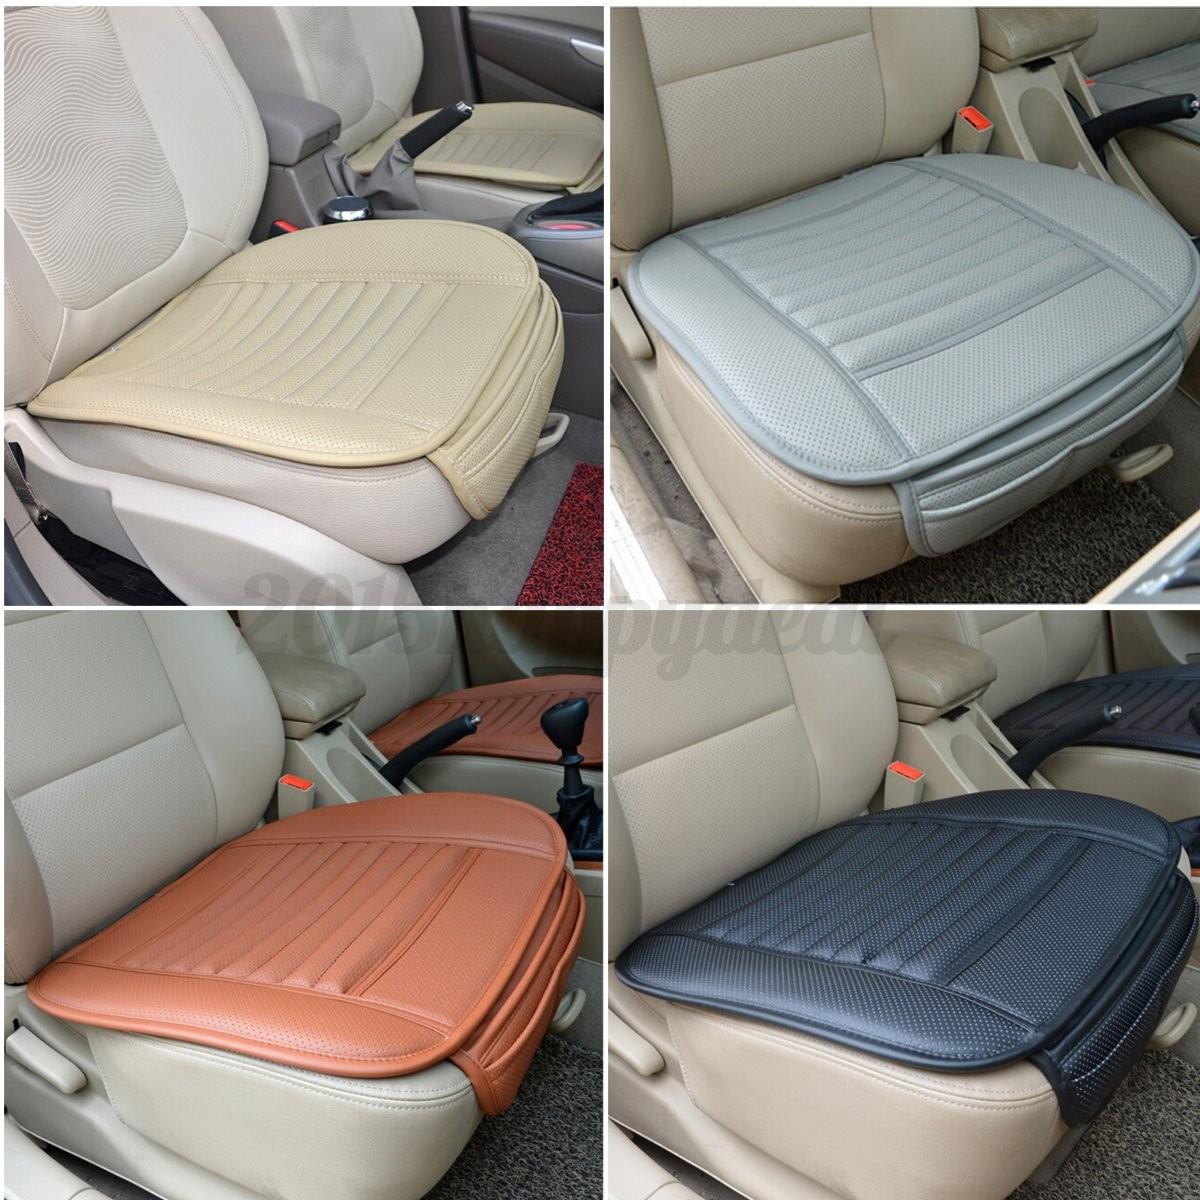 Carb n de bamb pu cuero fundas asiento auto coche oficina for Asientos de oficina